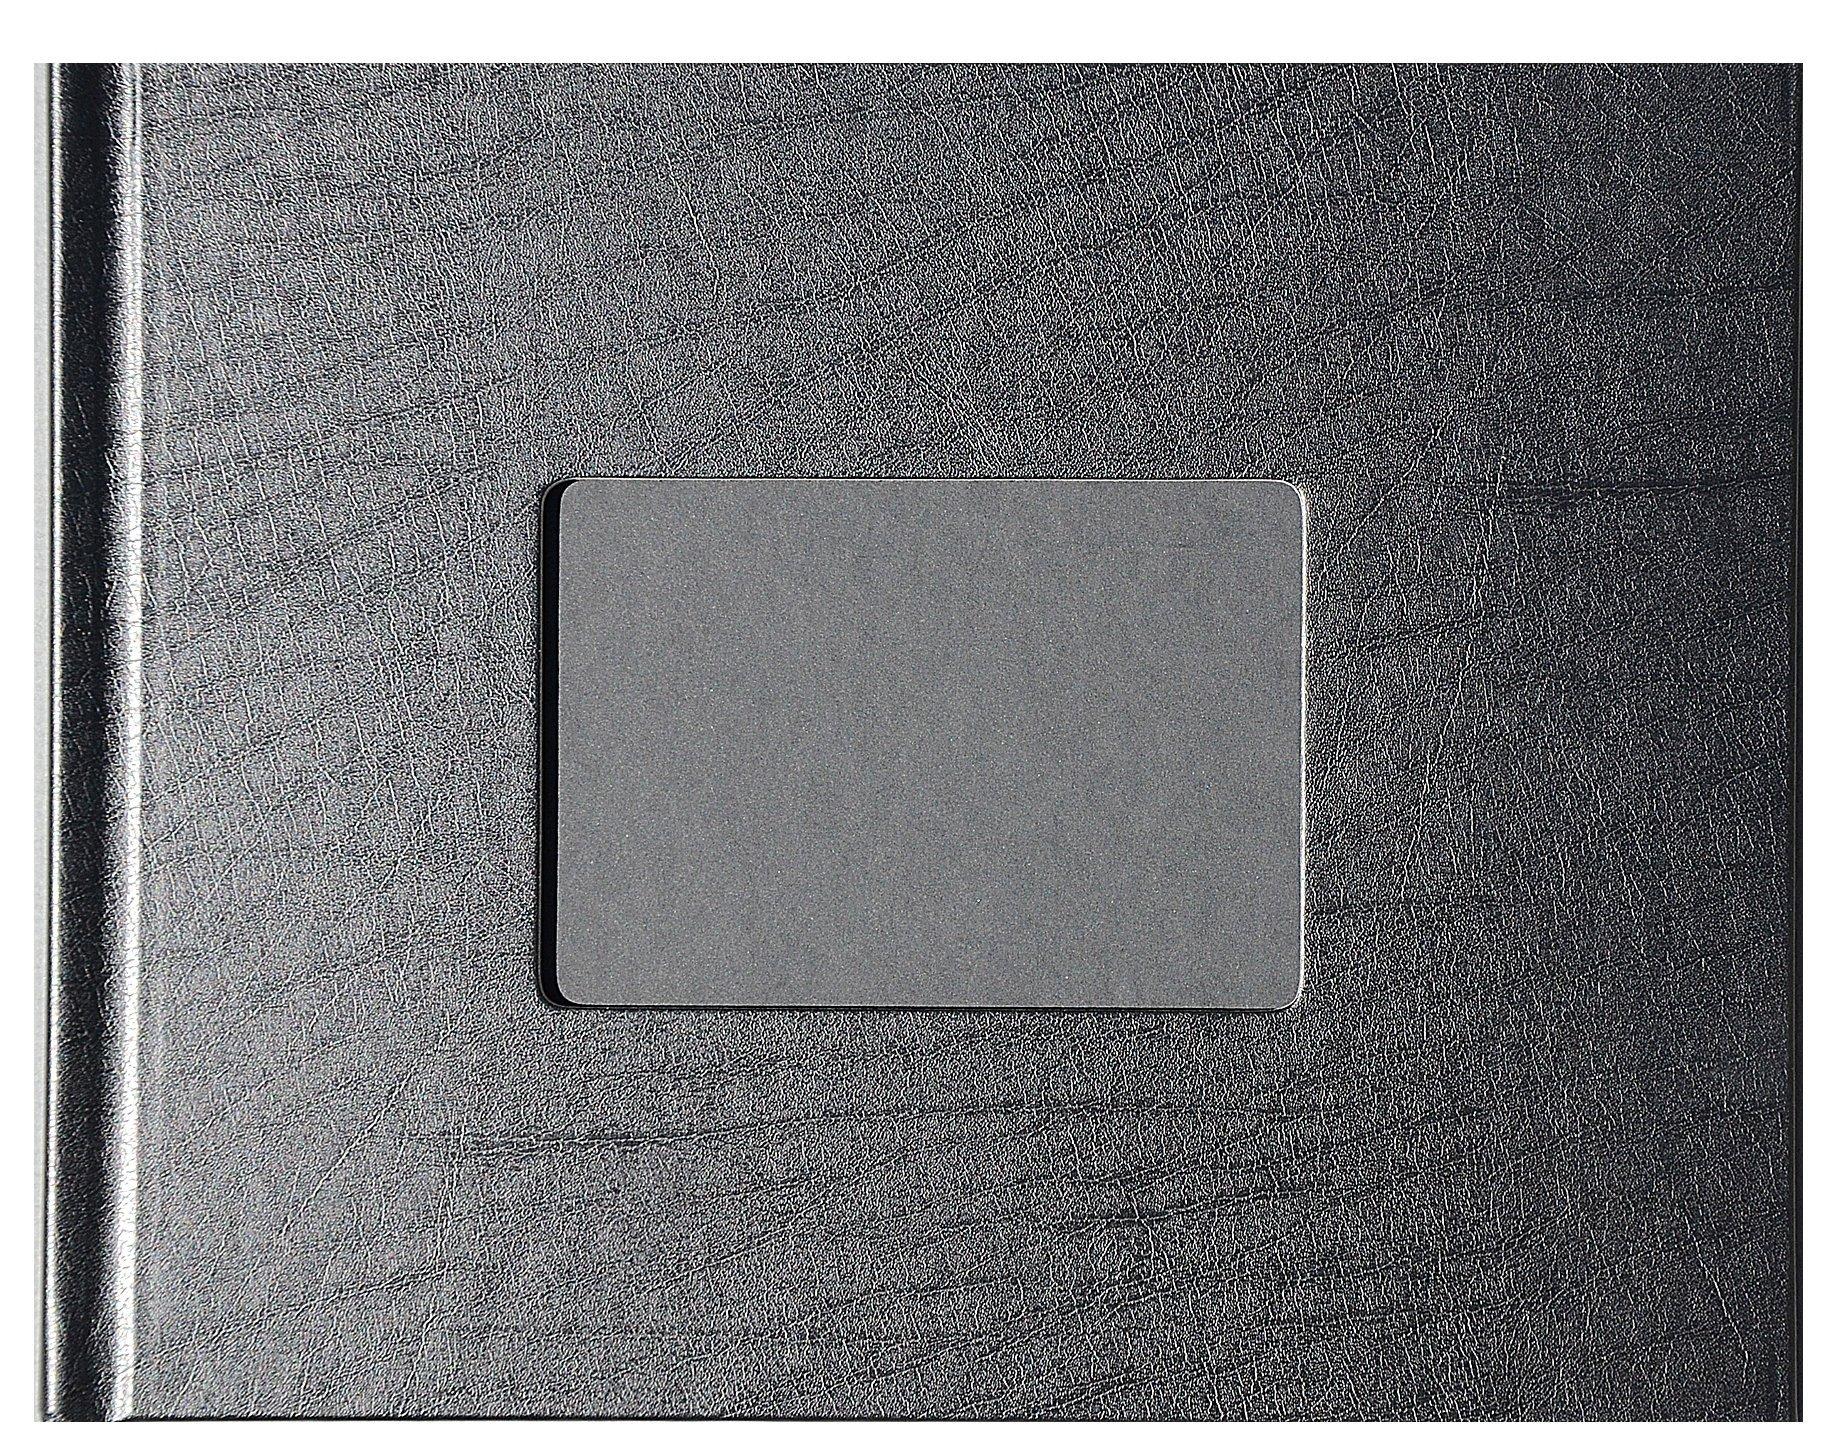 "Unibind 259FD8BA7DF 7mm Black Leatherette 8.5"" x 11"" Photobook - 10 Pack"